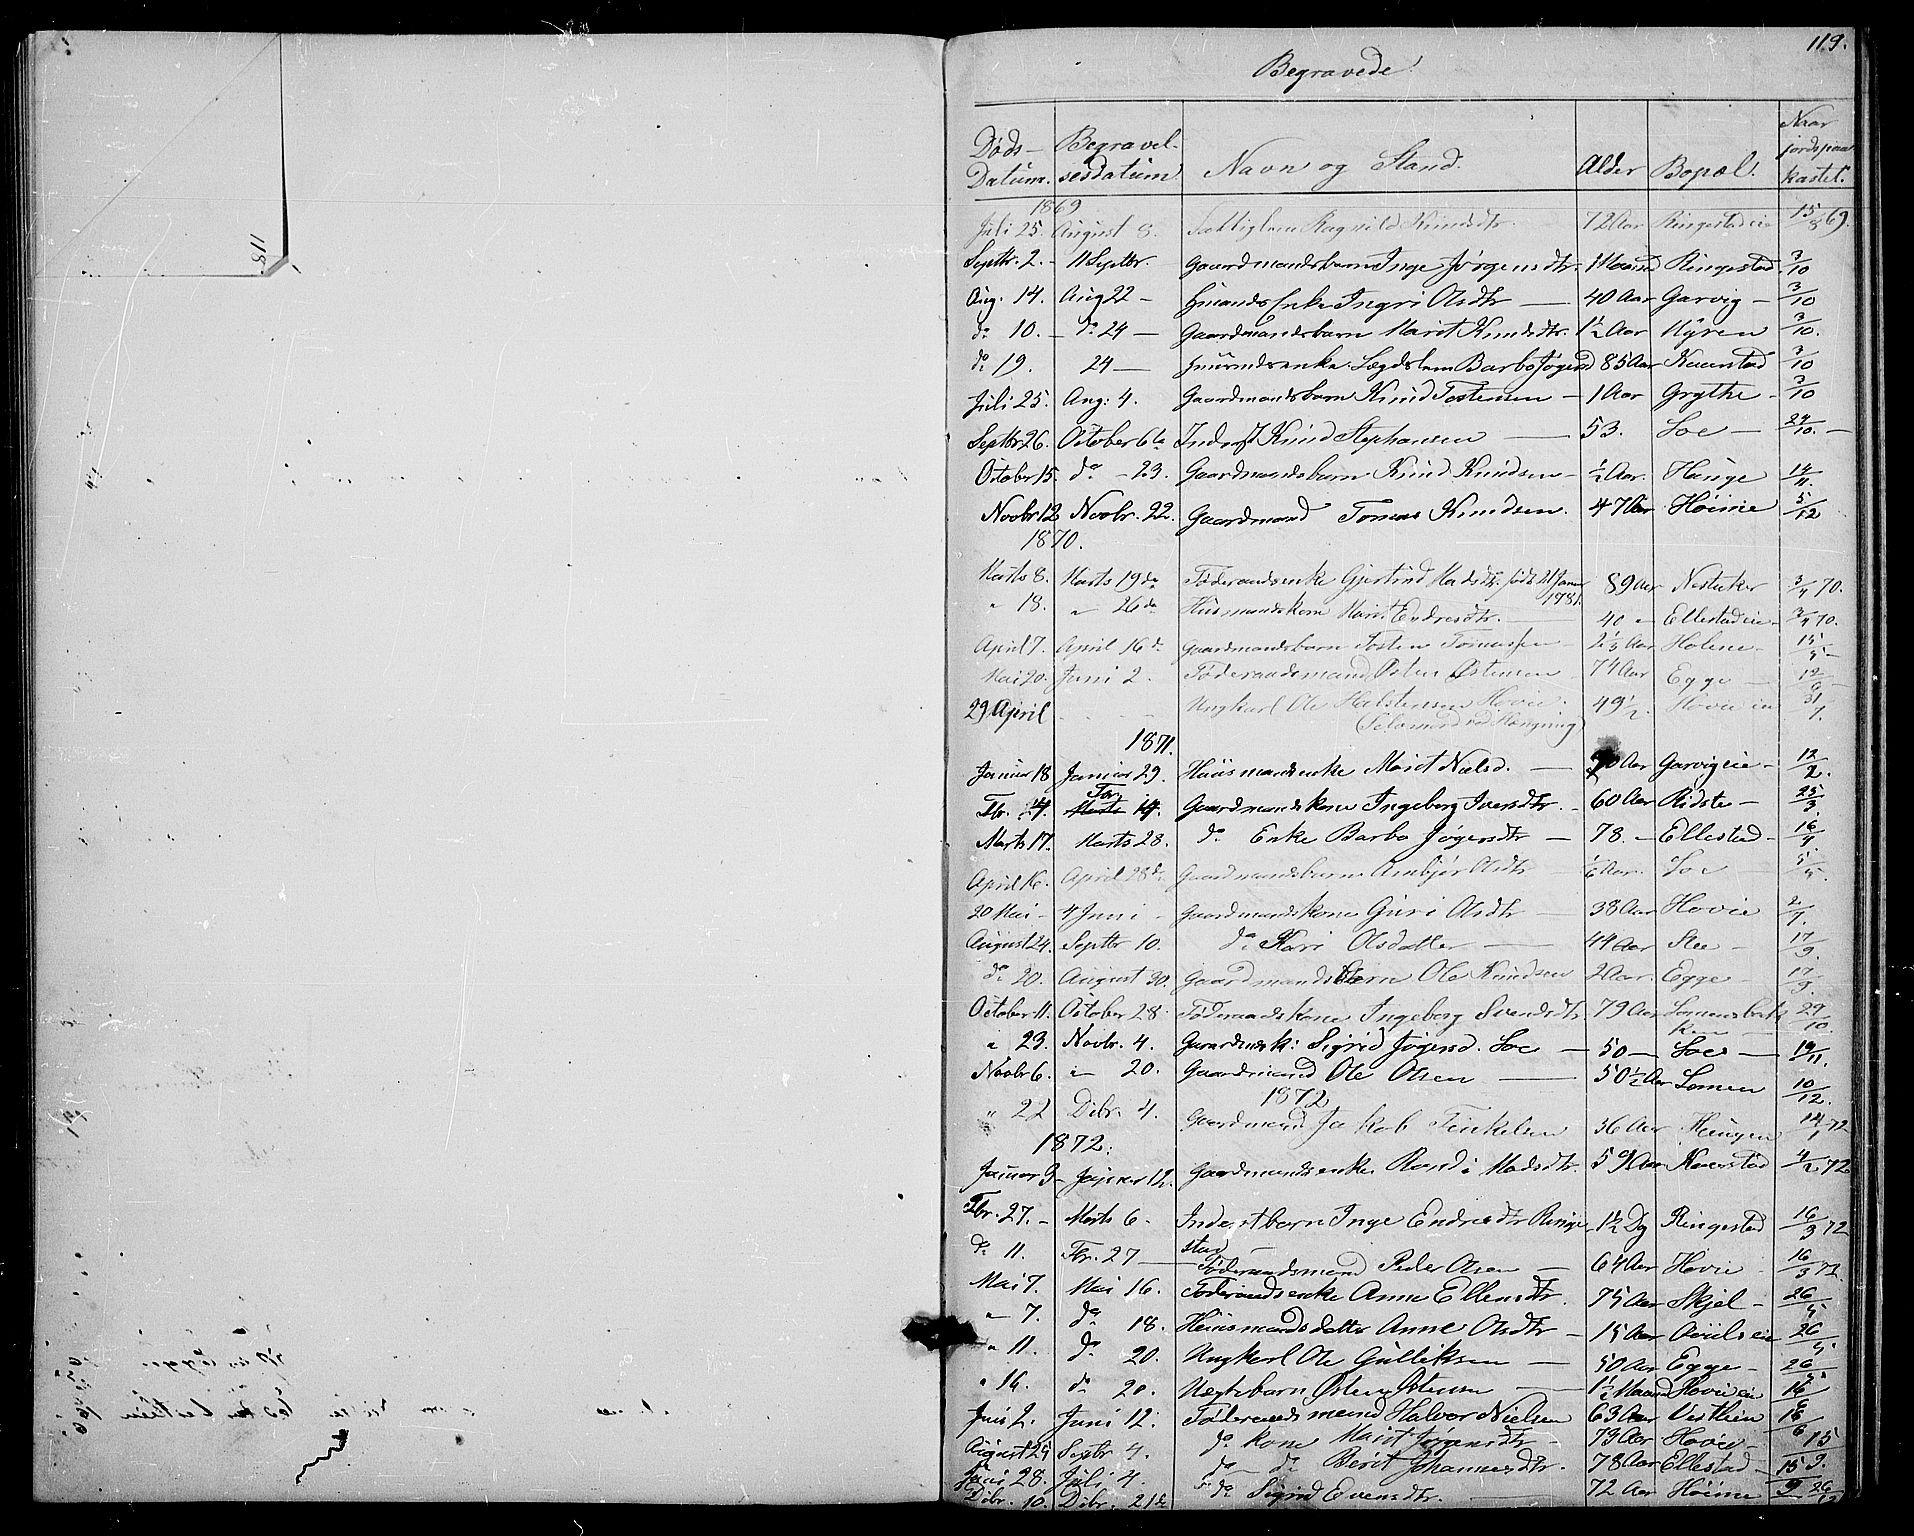 SAH, Vestre Slidre prestekontor, Klokkerbok nr. 2, 1869-1882, s. 119